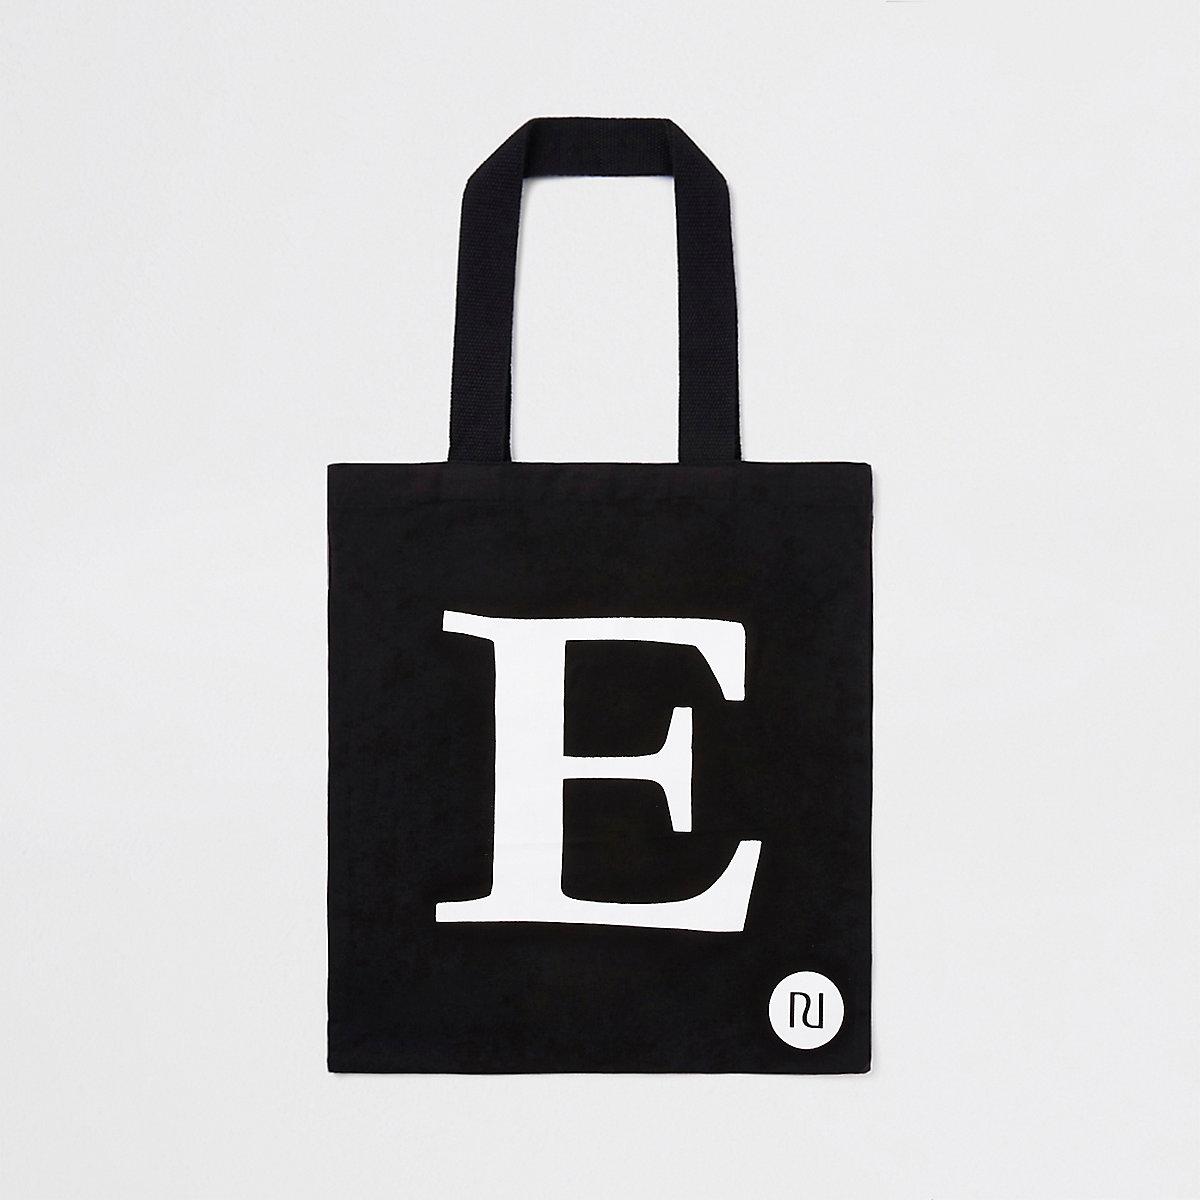 Zwarte shoppertas met 'E'-initiaal